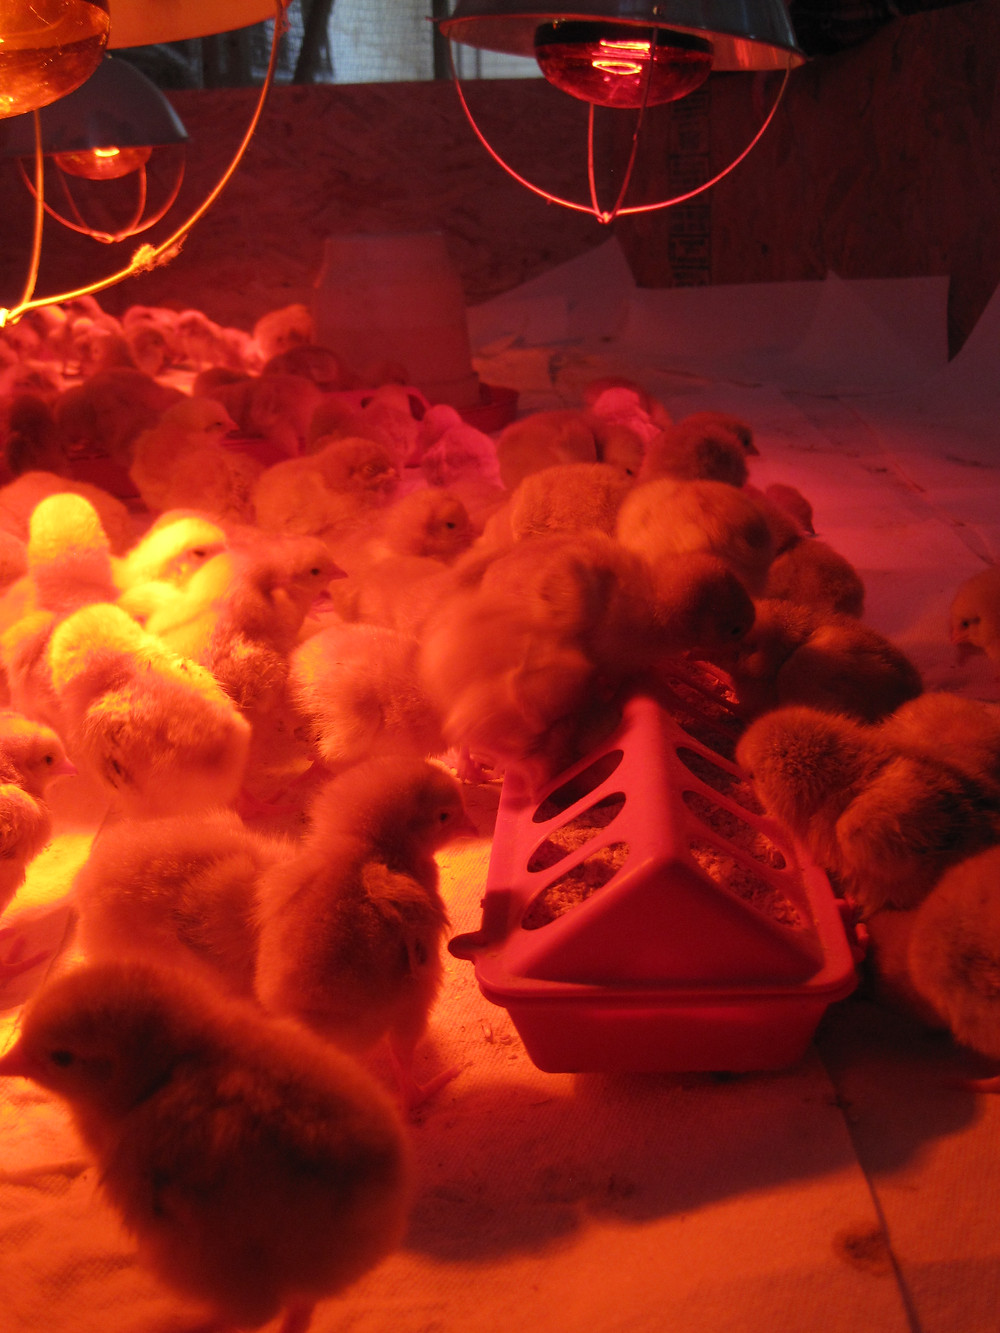 Apple Prairie Farm, homesteadingFreedom Rangers, Broilers, homegrown chicken, pastured chicken